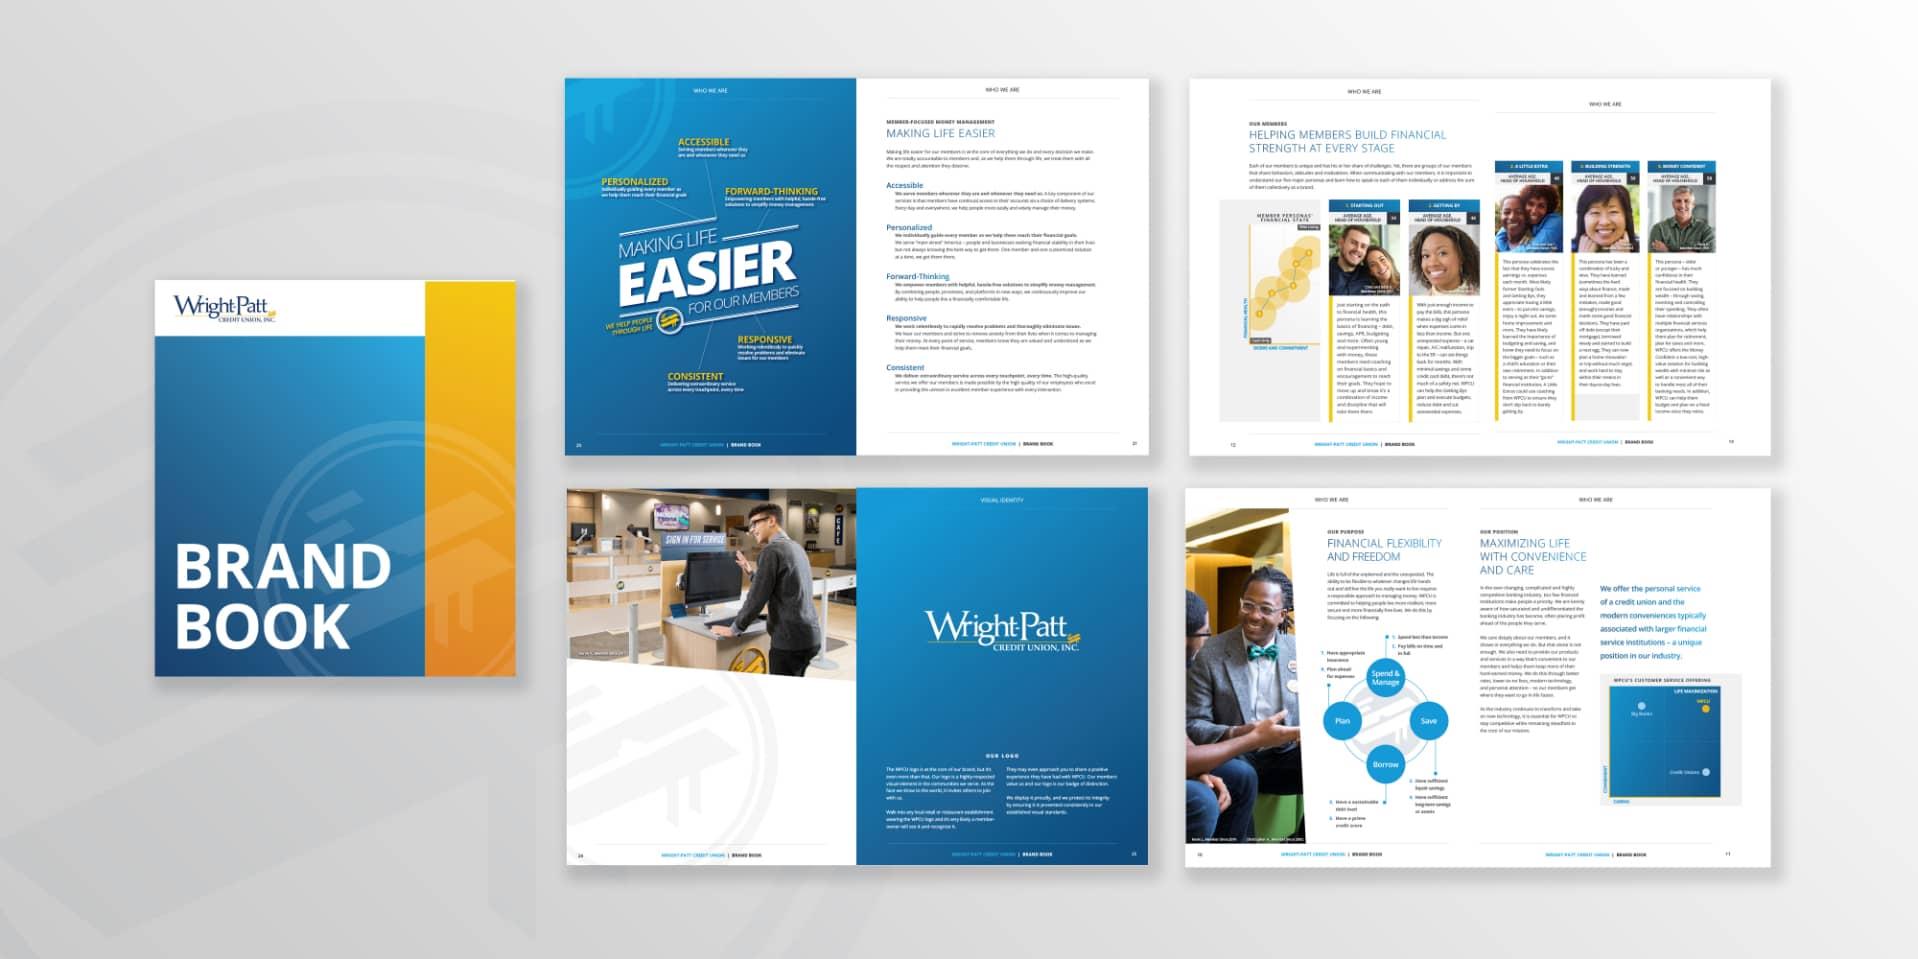 Wright-Patt Credit Union brand book